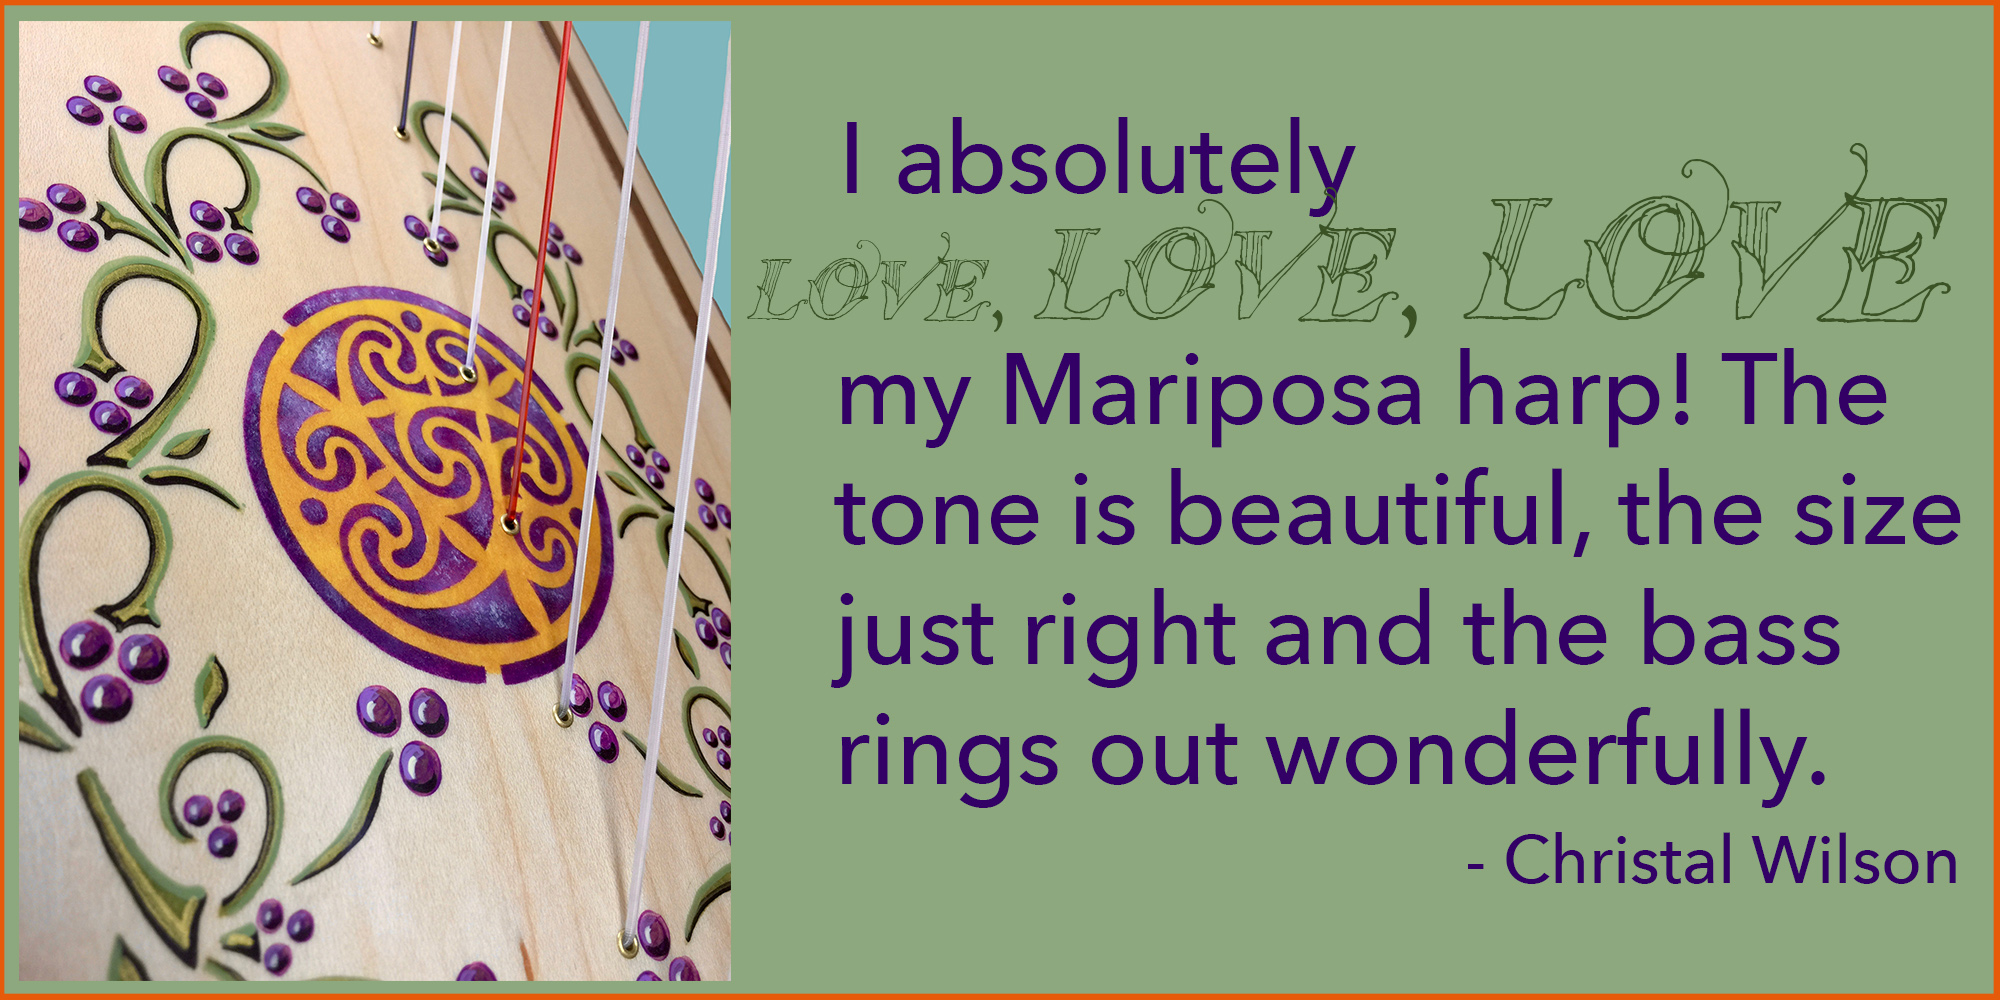 Mariposa Harp and Christal Wilson